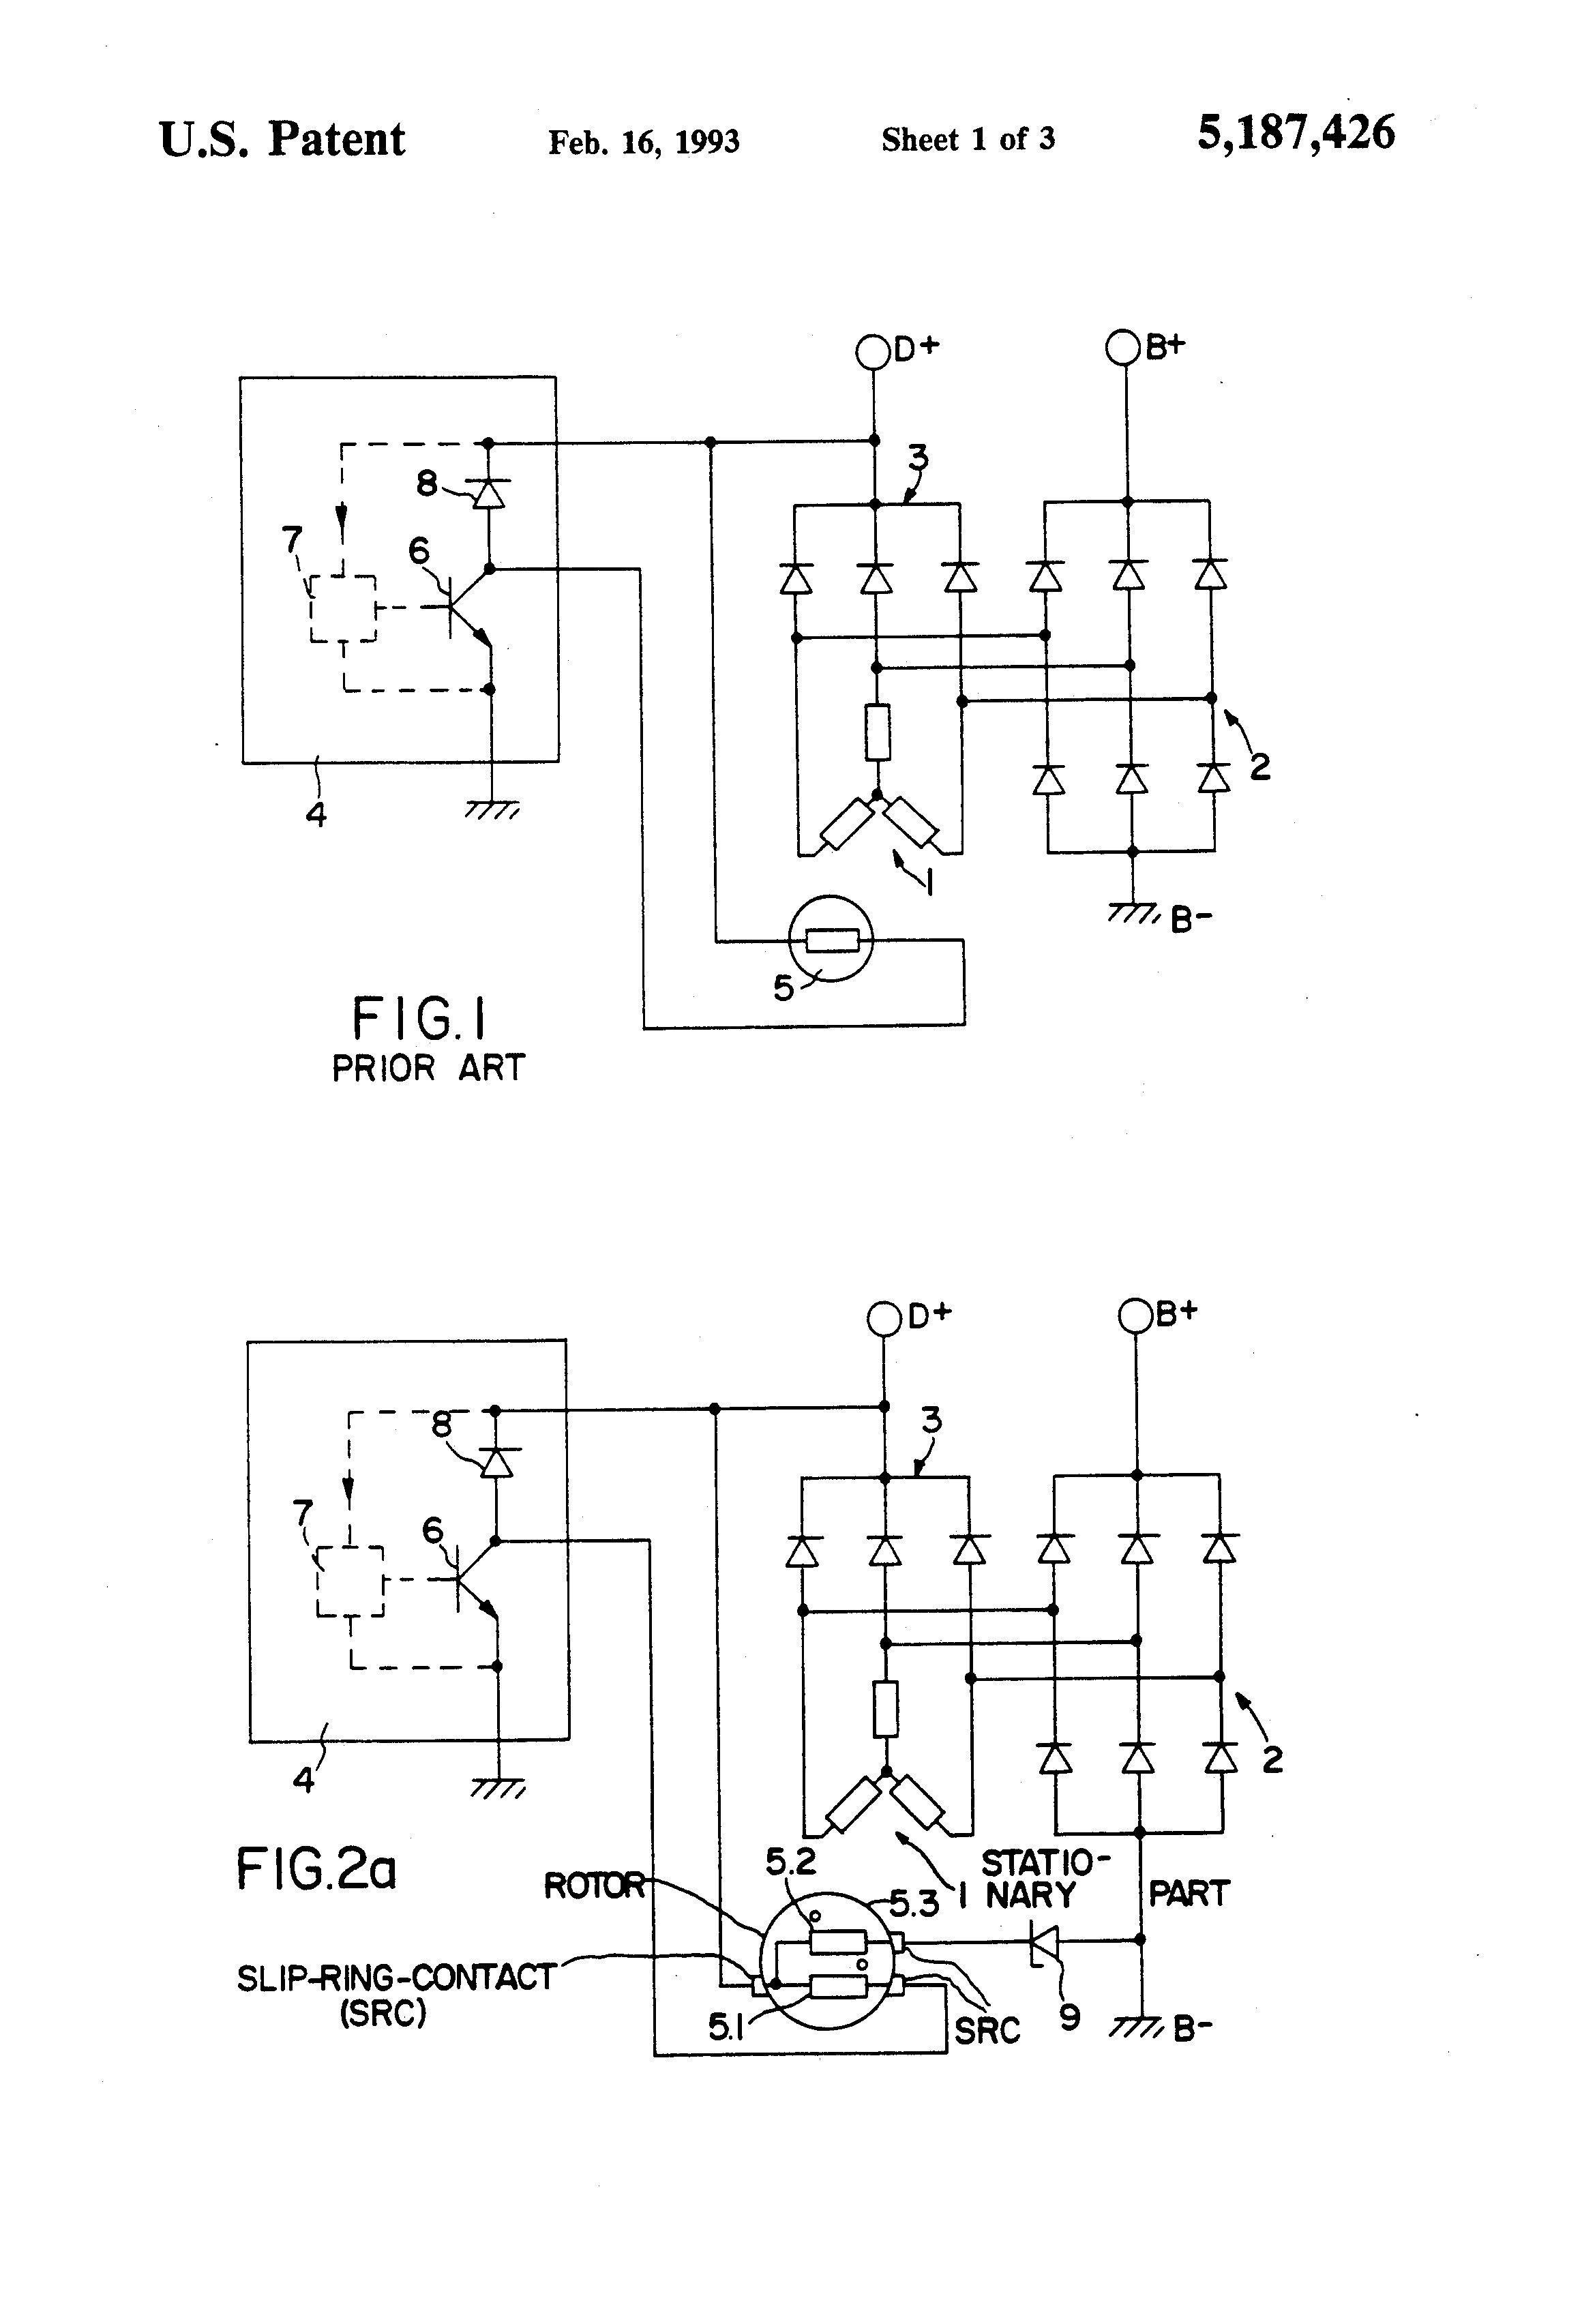 Marine Diesel Engine Diagram Electrical Wiring Diagram Diagram Software Open Source